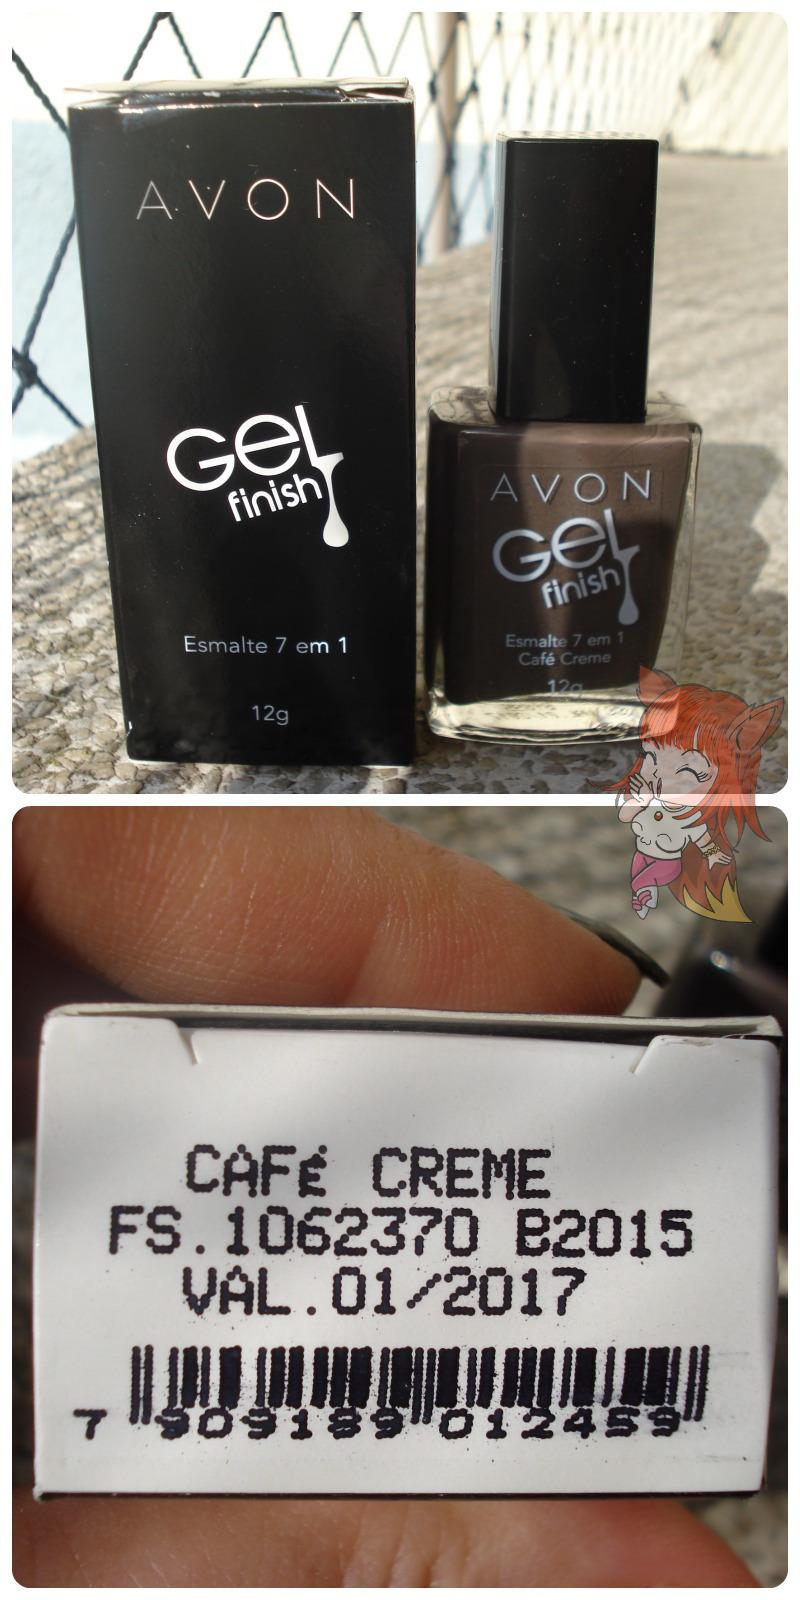 Esmalte em Gel Avon :: Café Creme